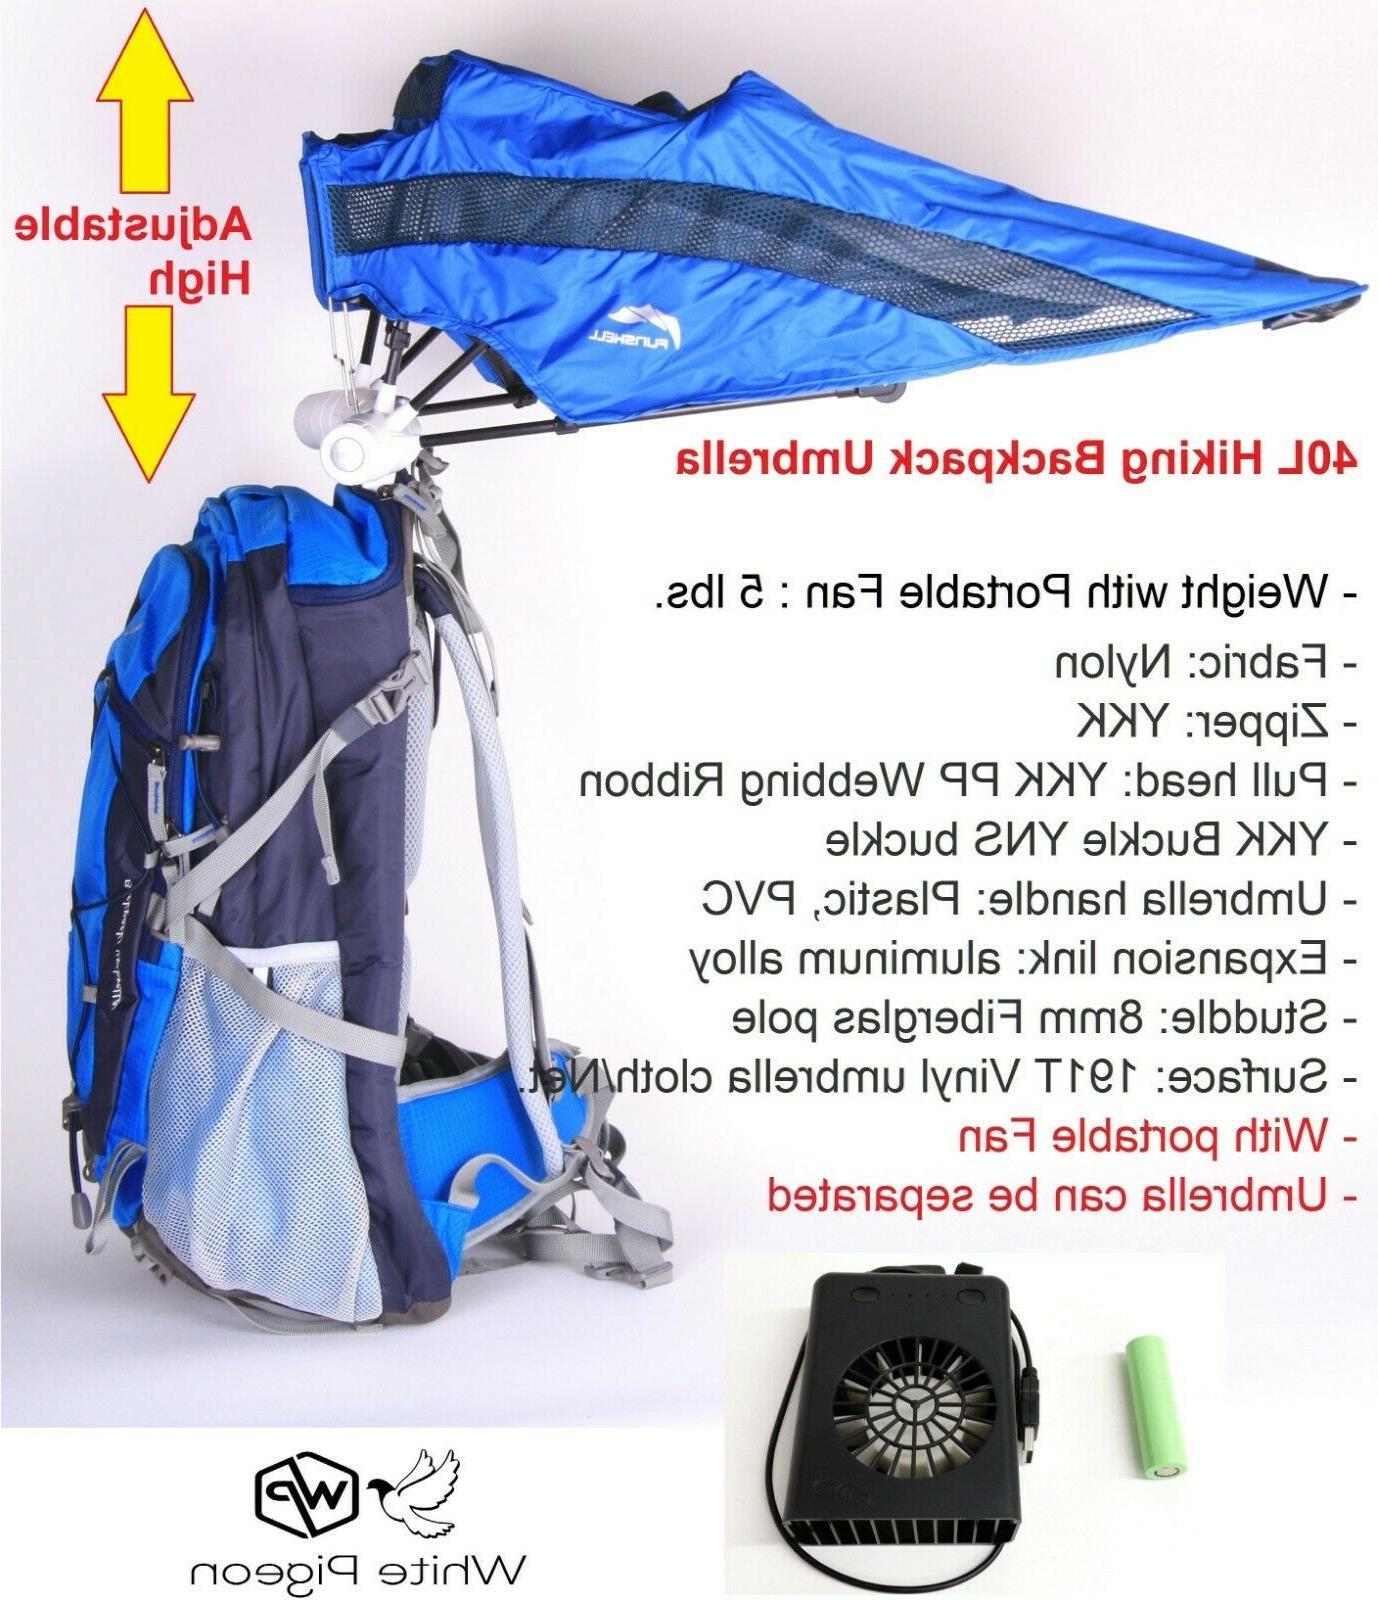 funshell 40l hiking backpack umbrella camping uv